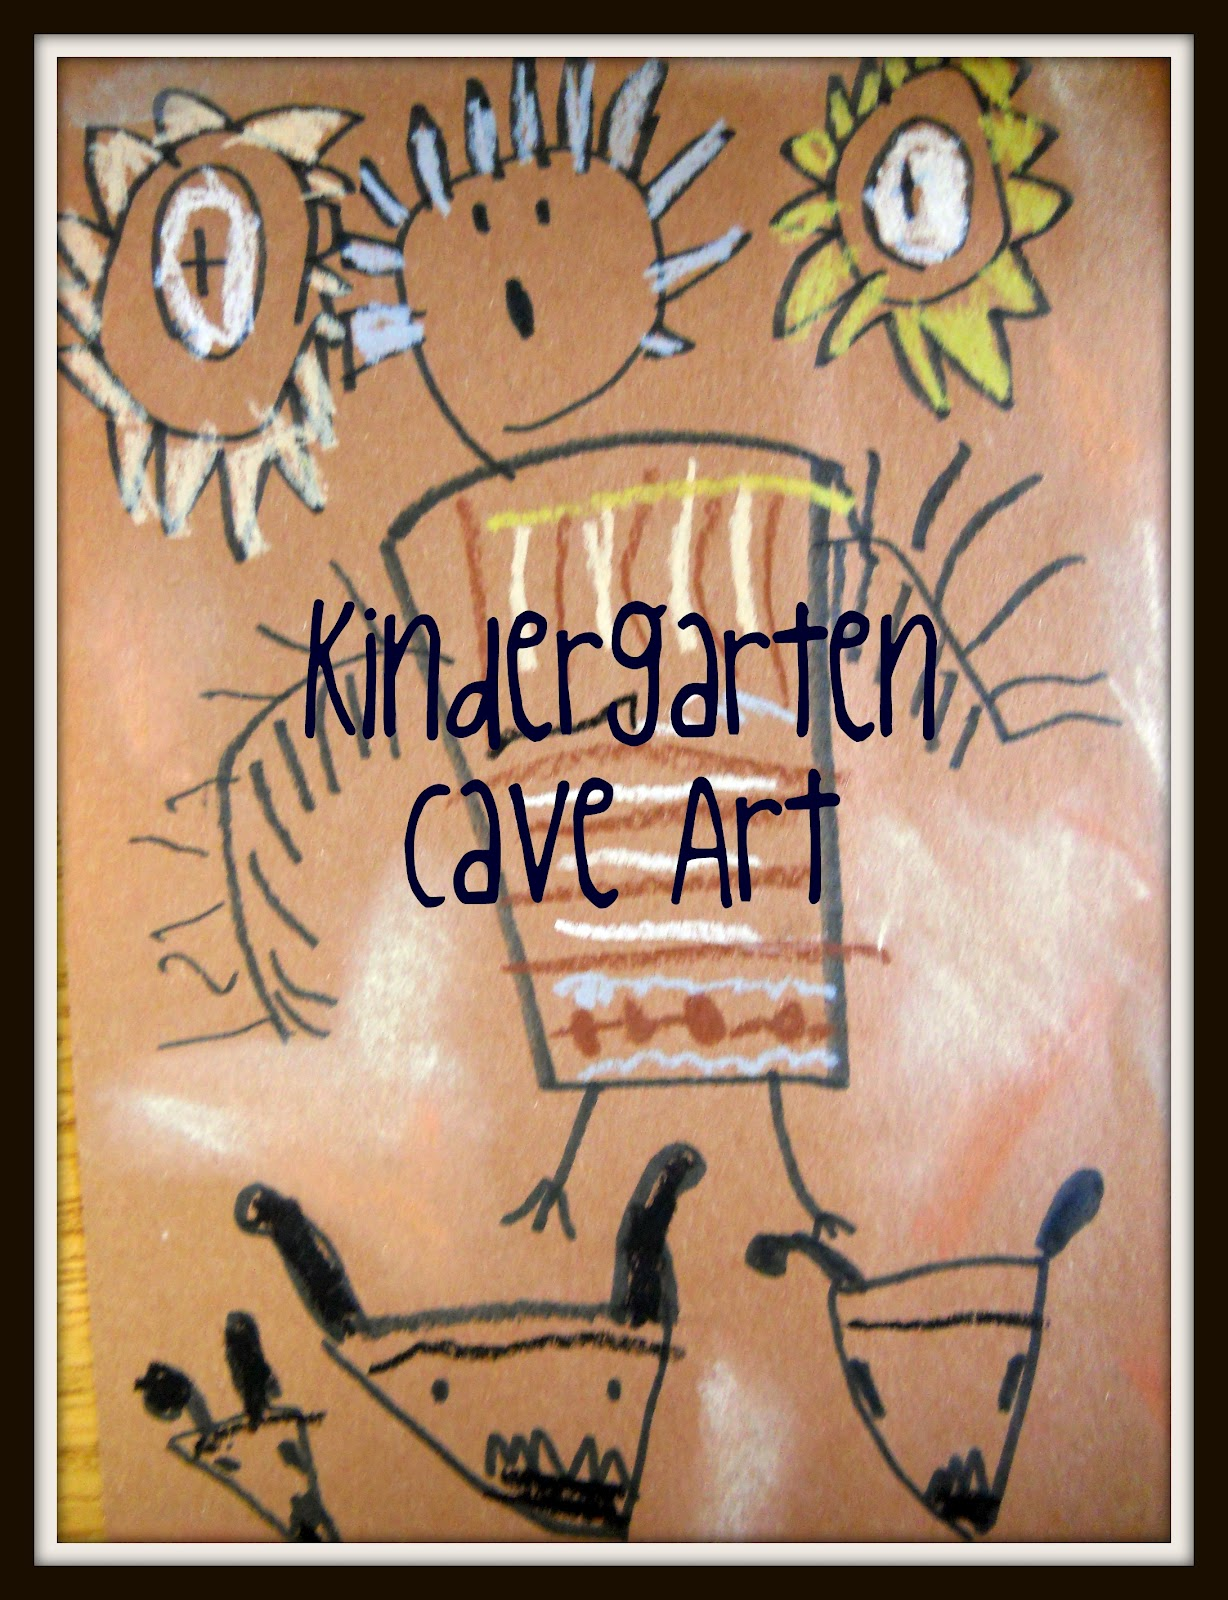 The Elementary Art Room Cave Art